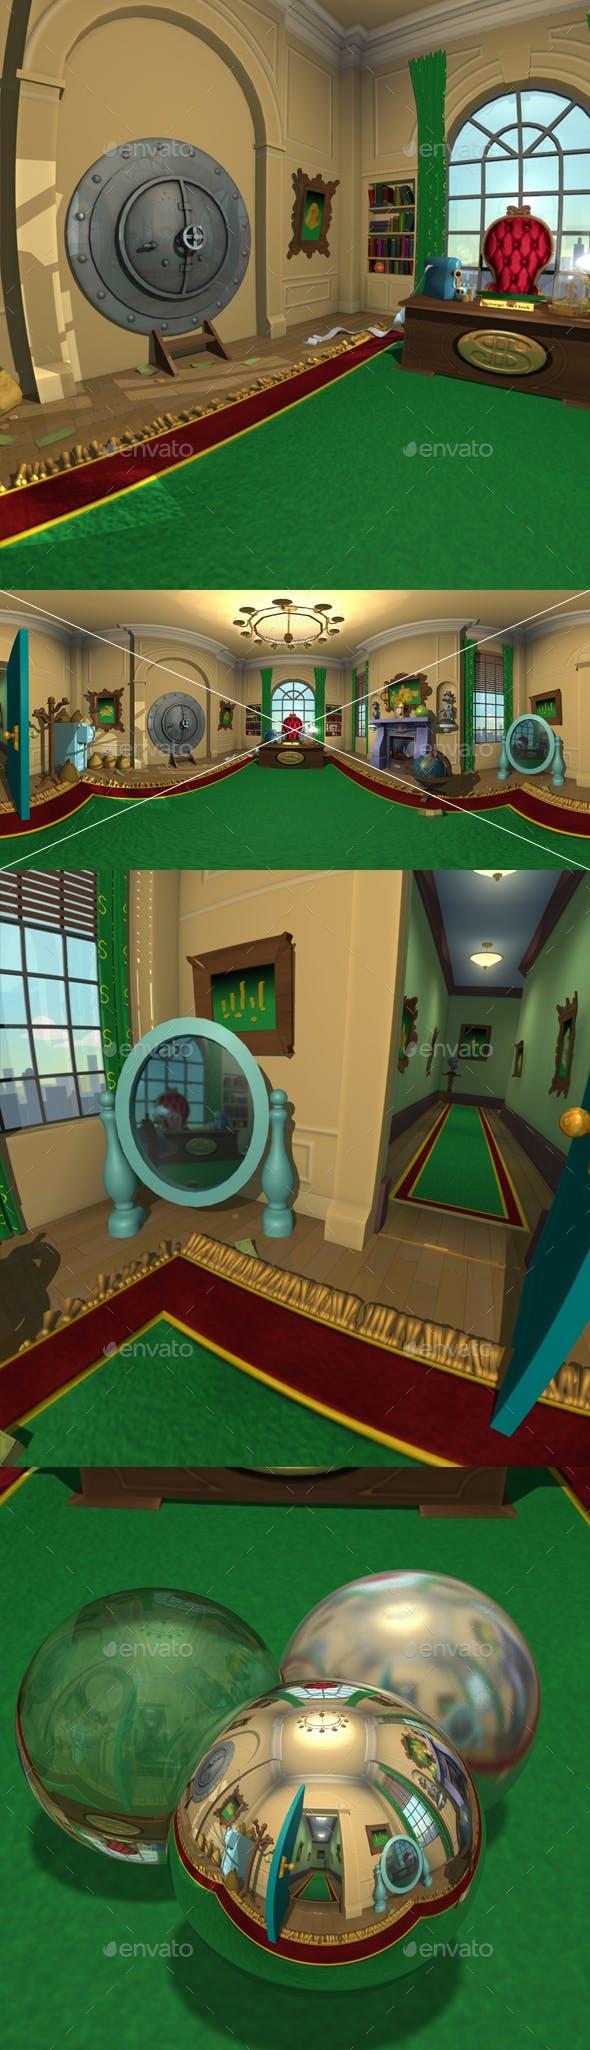 Cartoon Bank Office HDRI - 3DOcean Item for Sale